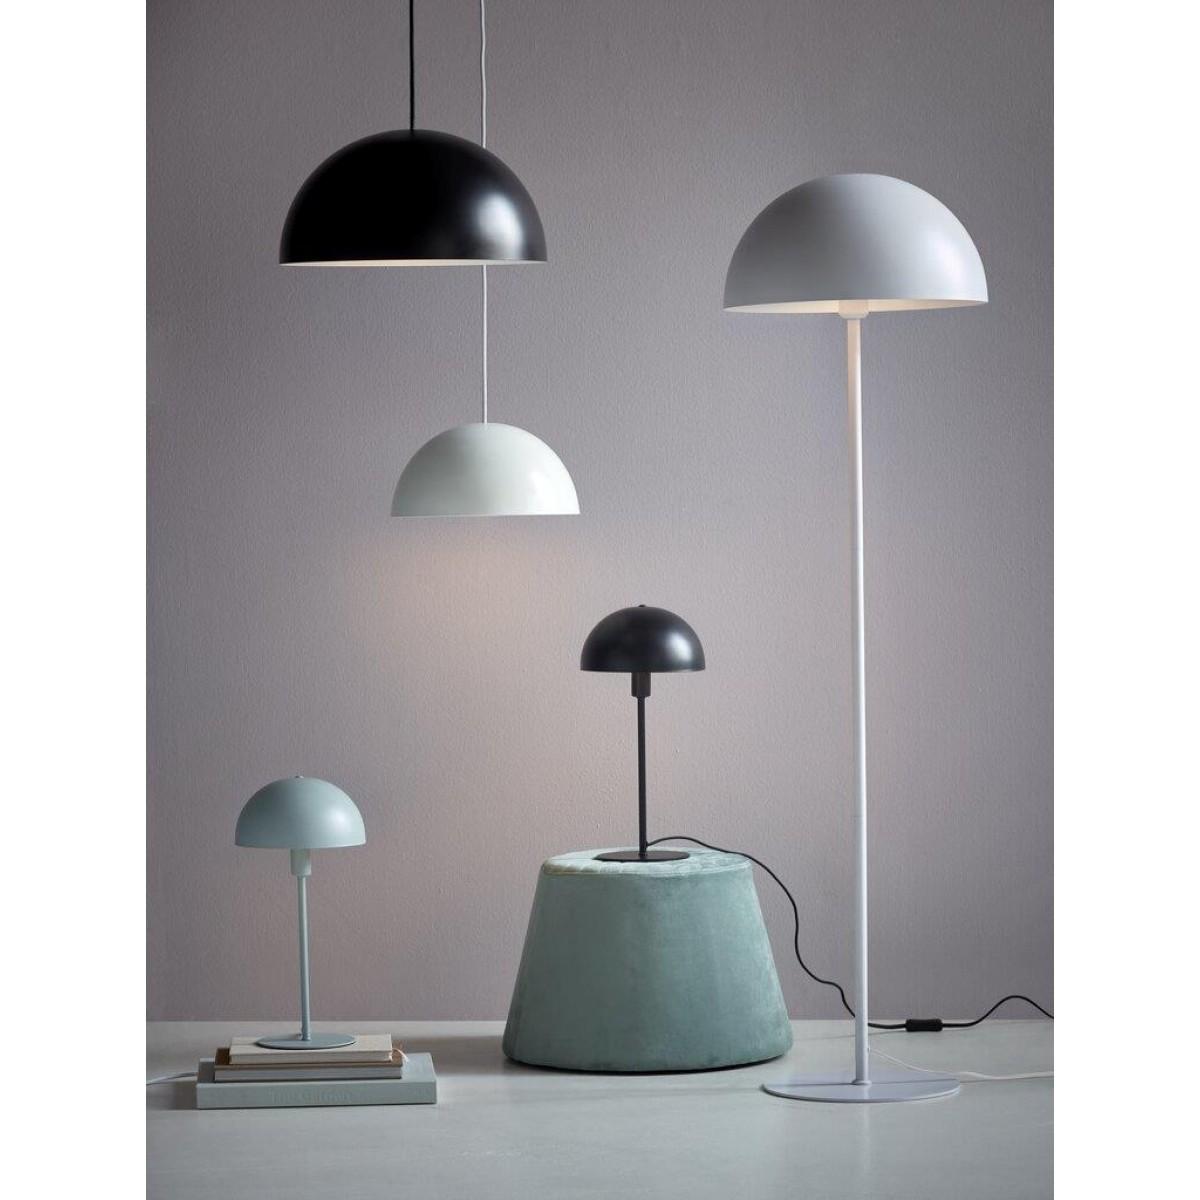 NORDLUXBordlampeellensort-05